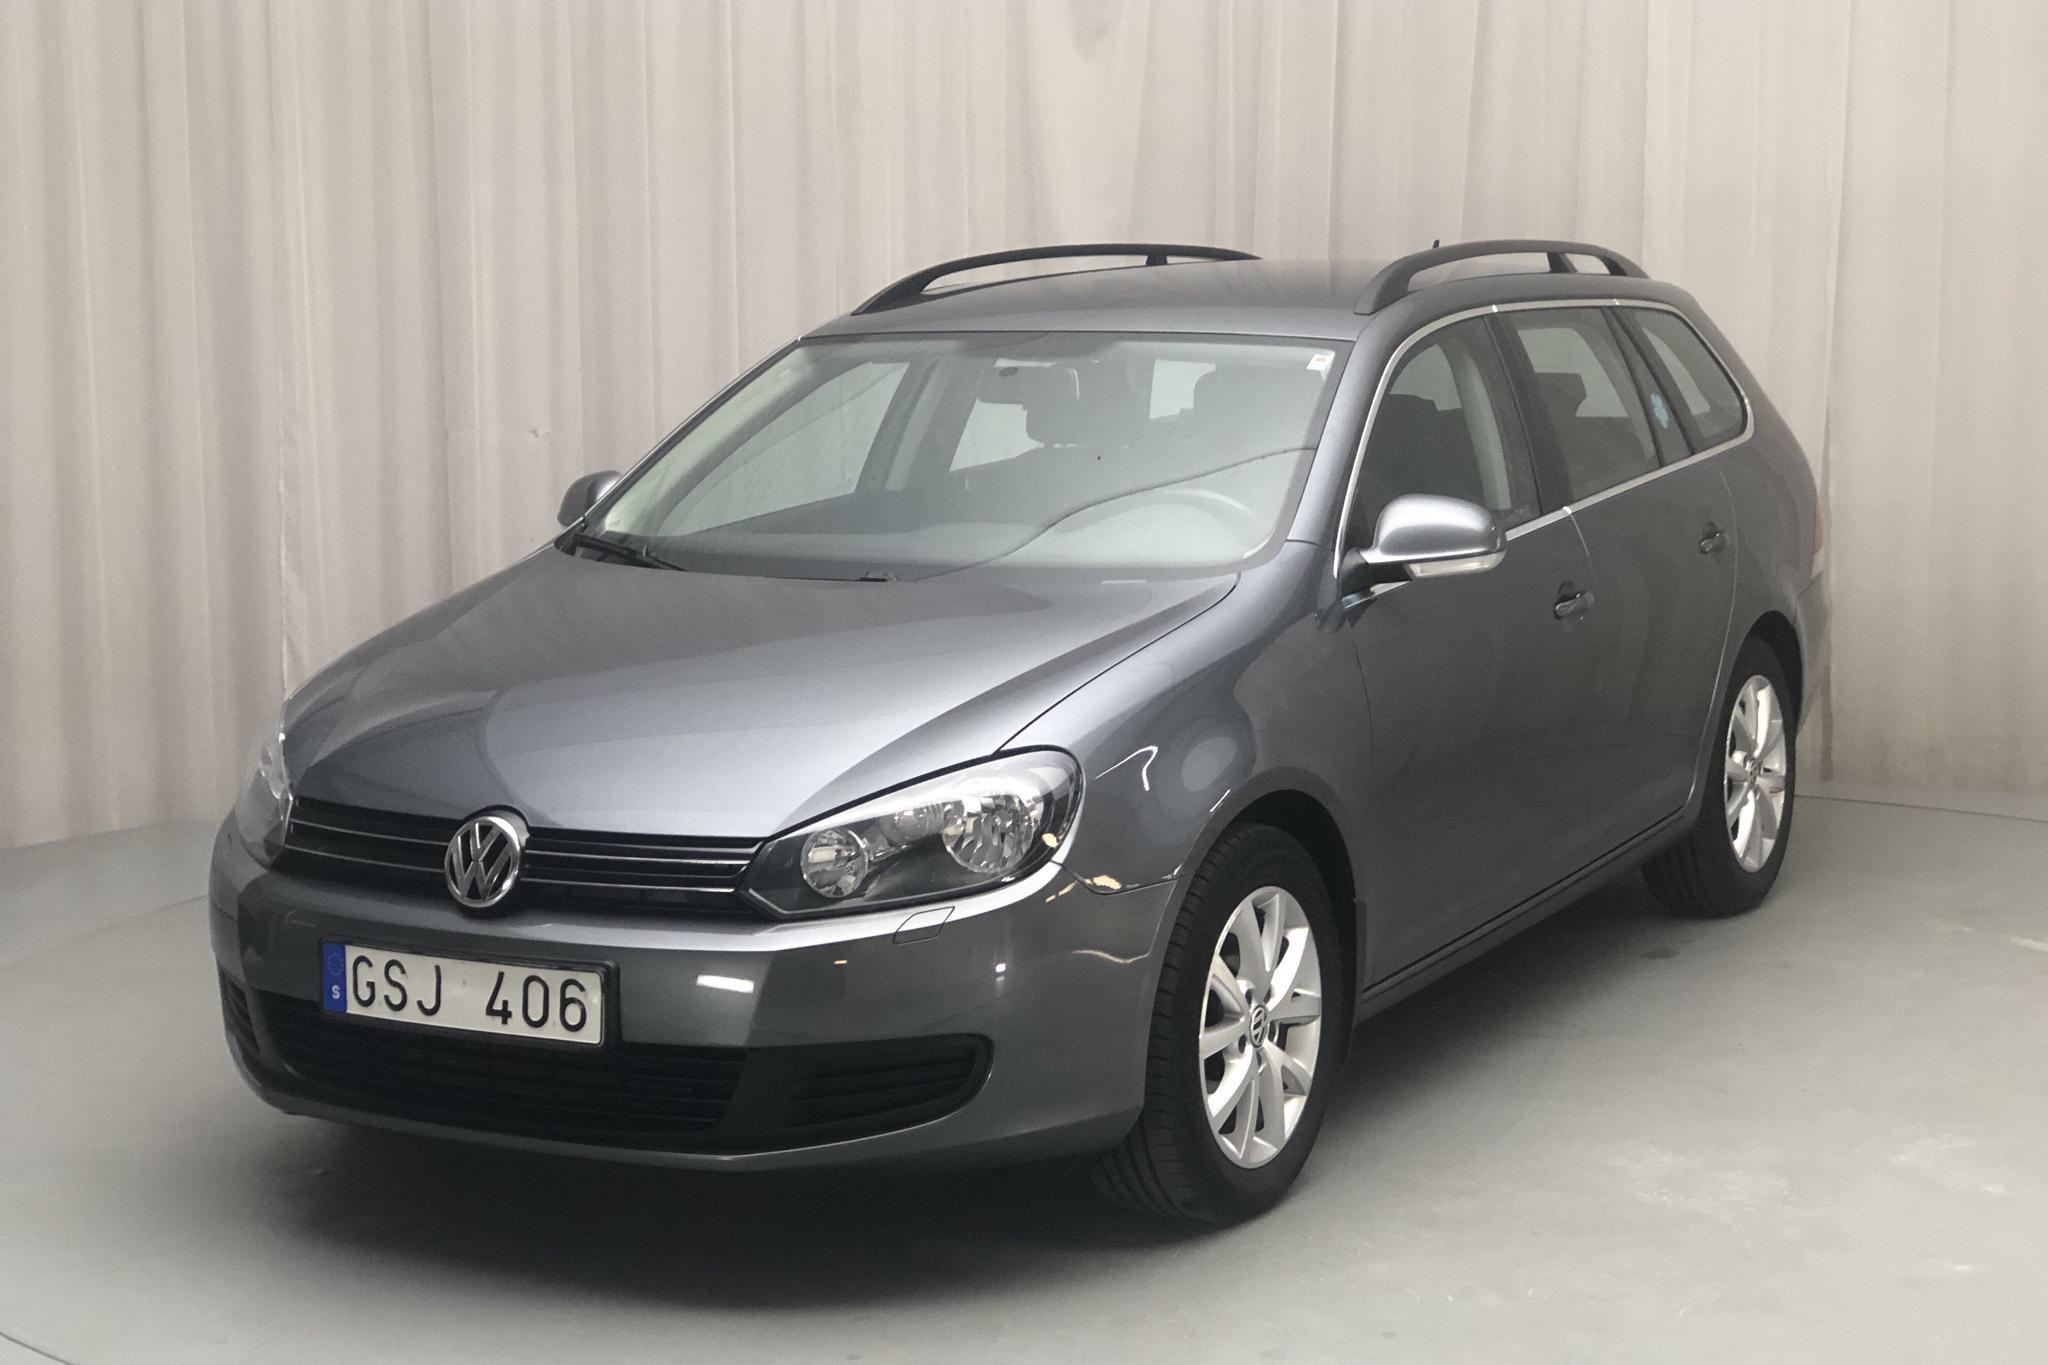 VW Golf VI 1.6 TDI BlueMotion Technology Variant (105hk) - 98 720 km - Manual - Dark Grey - 2011